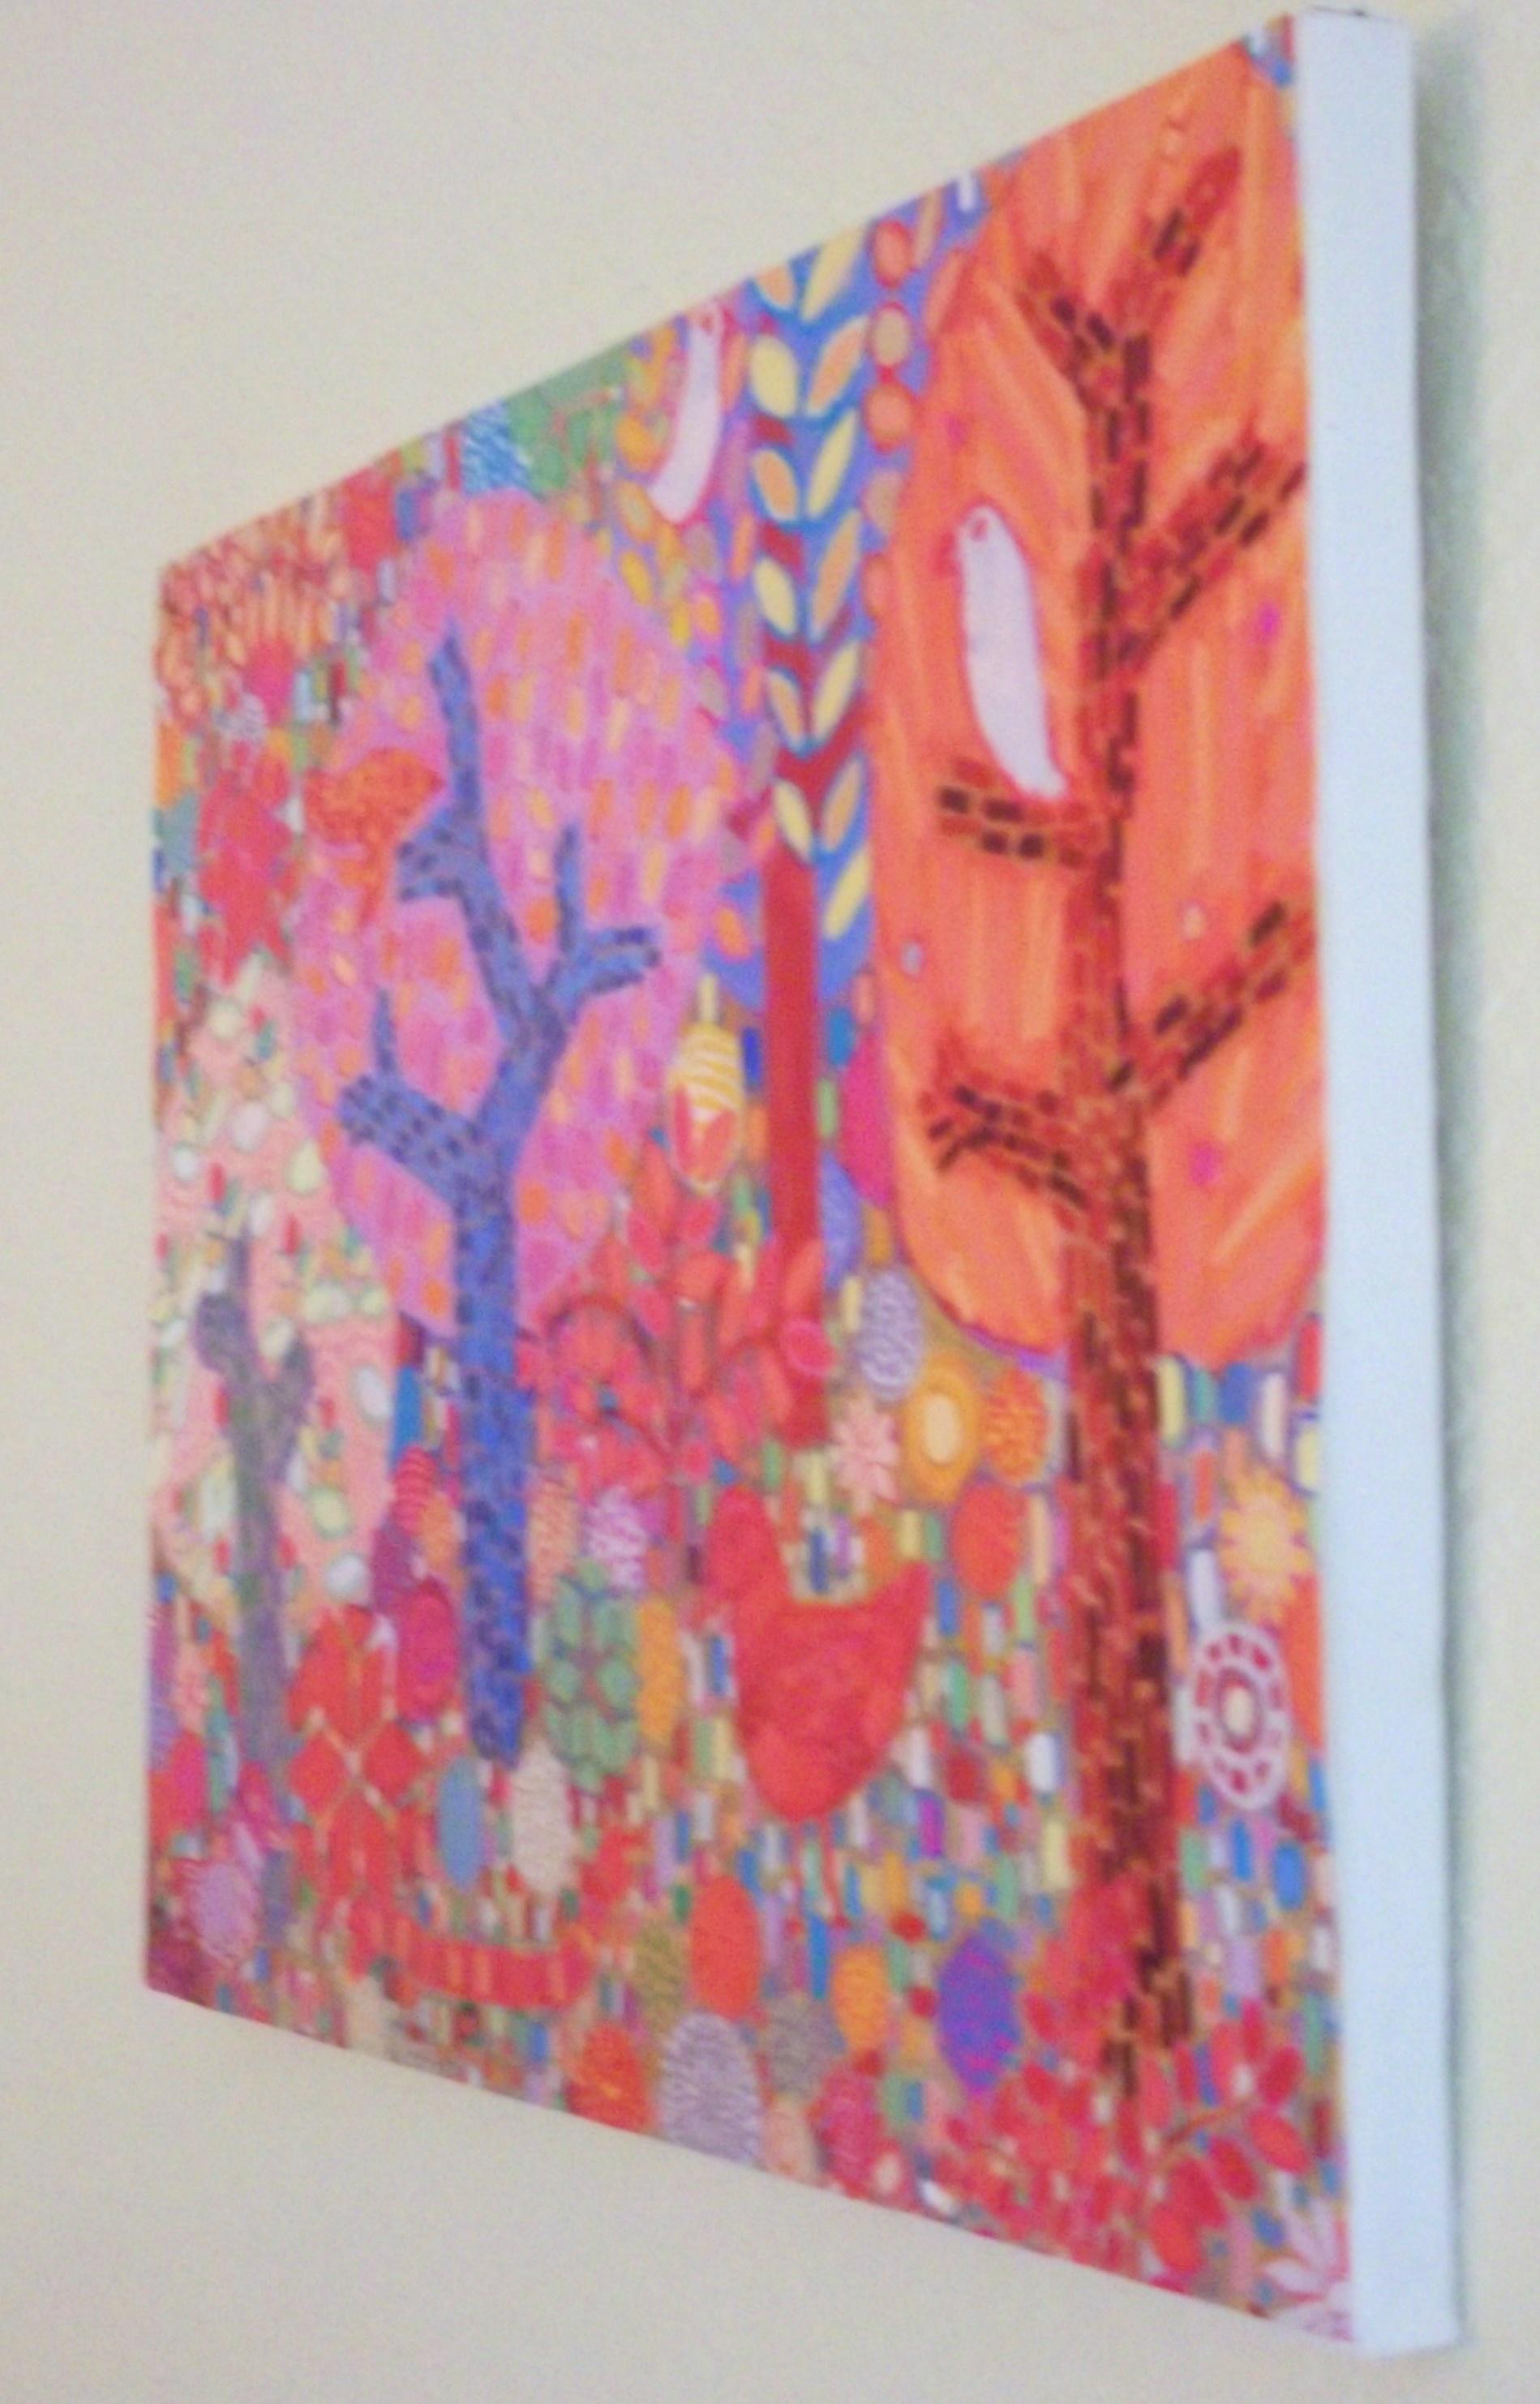 DIY Transform a Print into Painting - Mounting Prints on ...